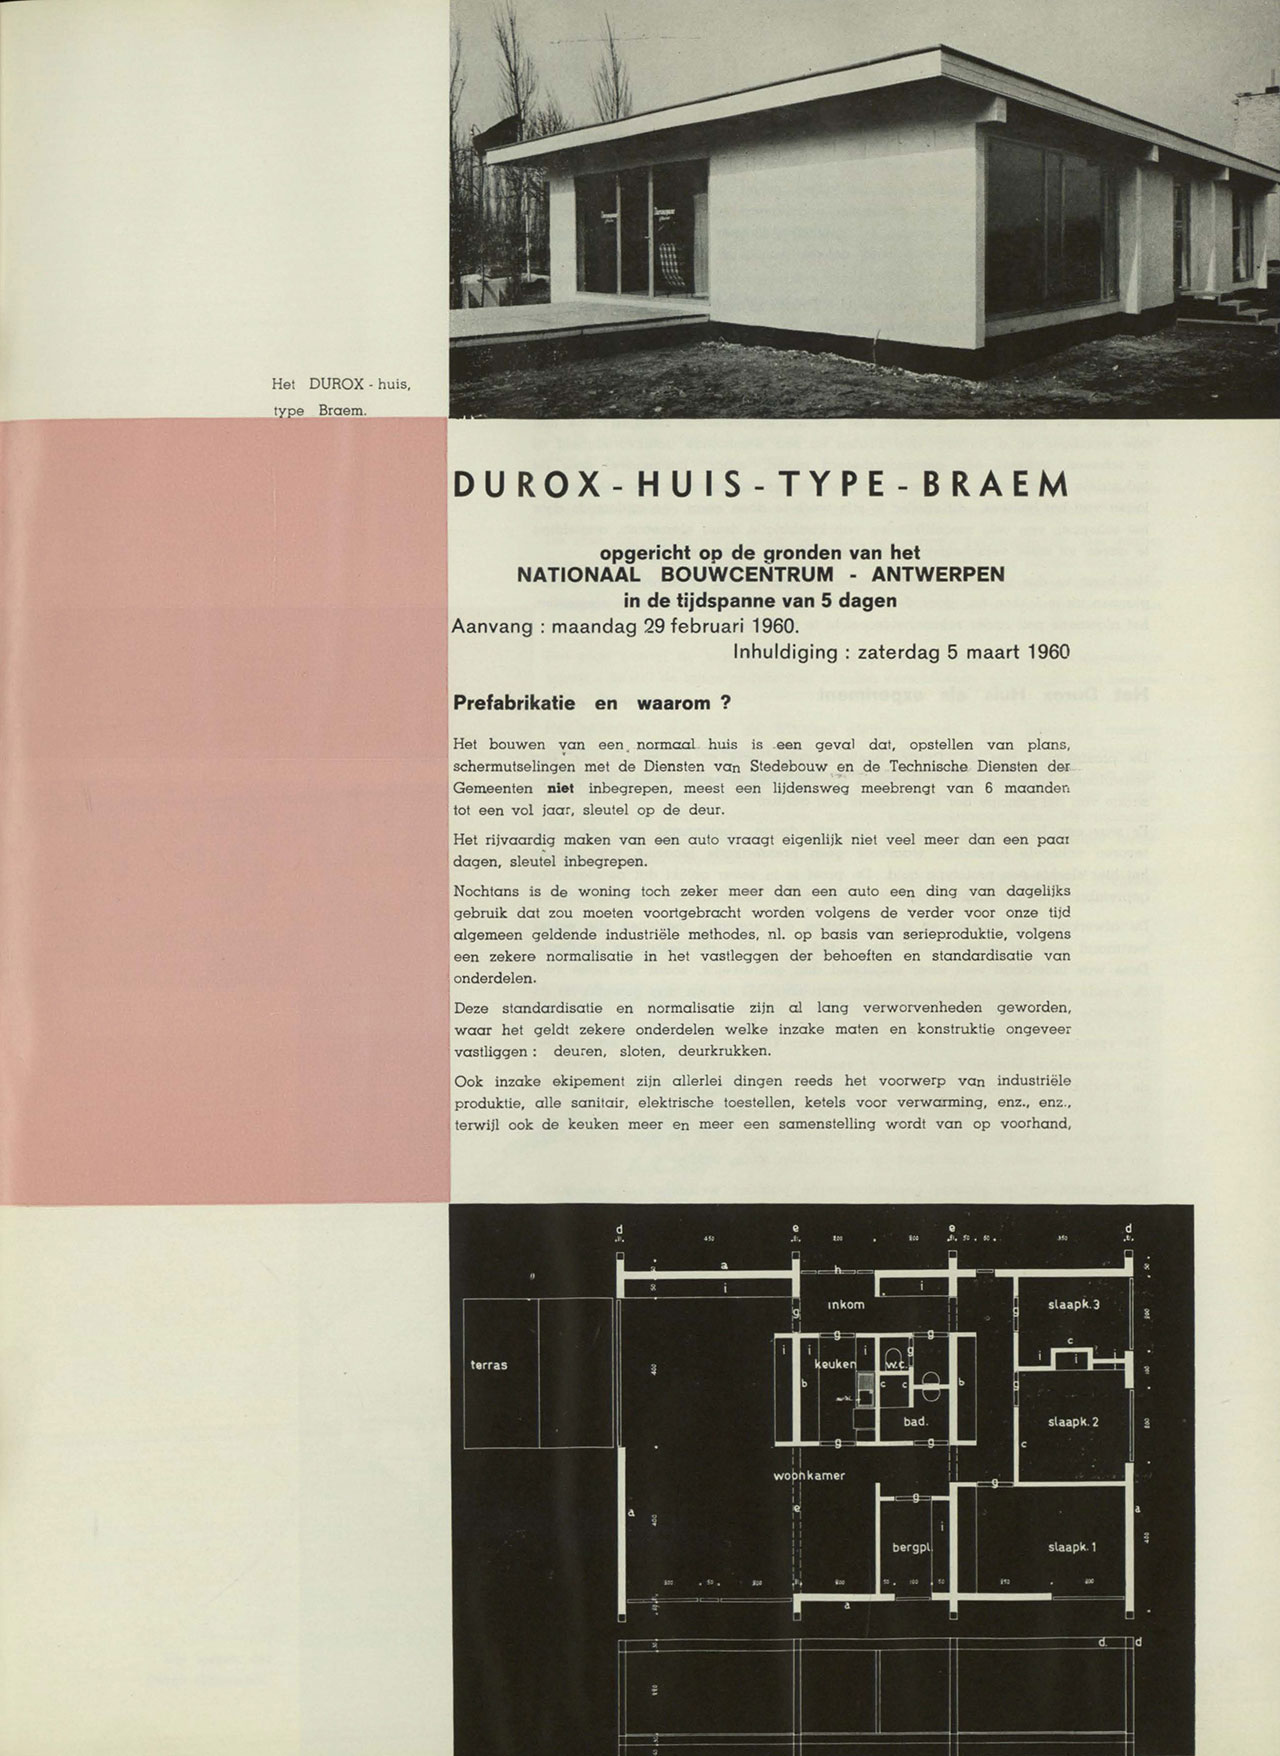 Durox huis – type Braem